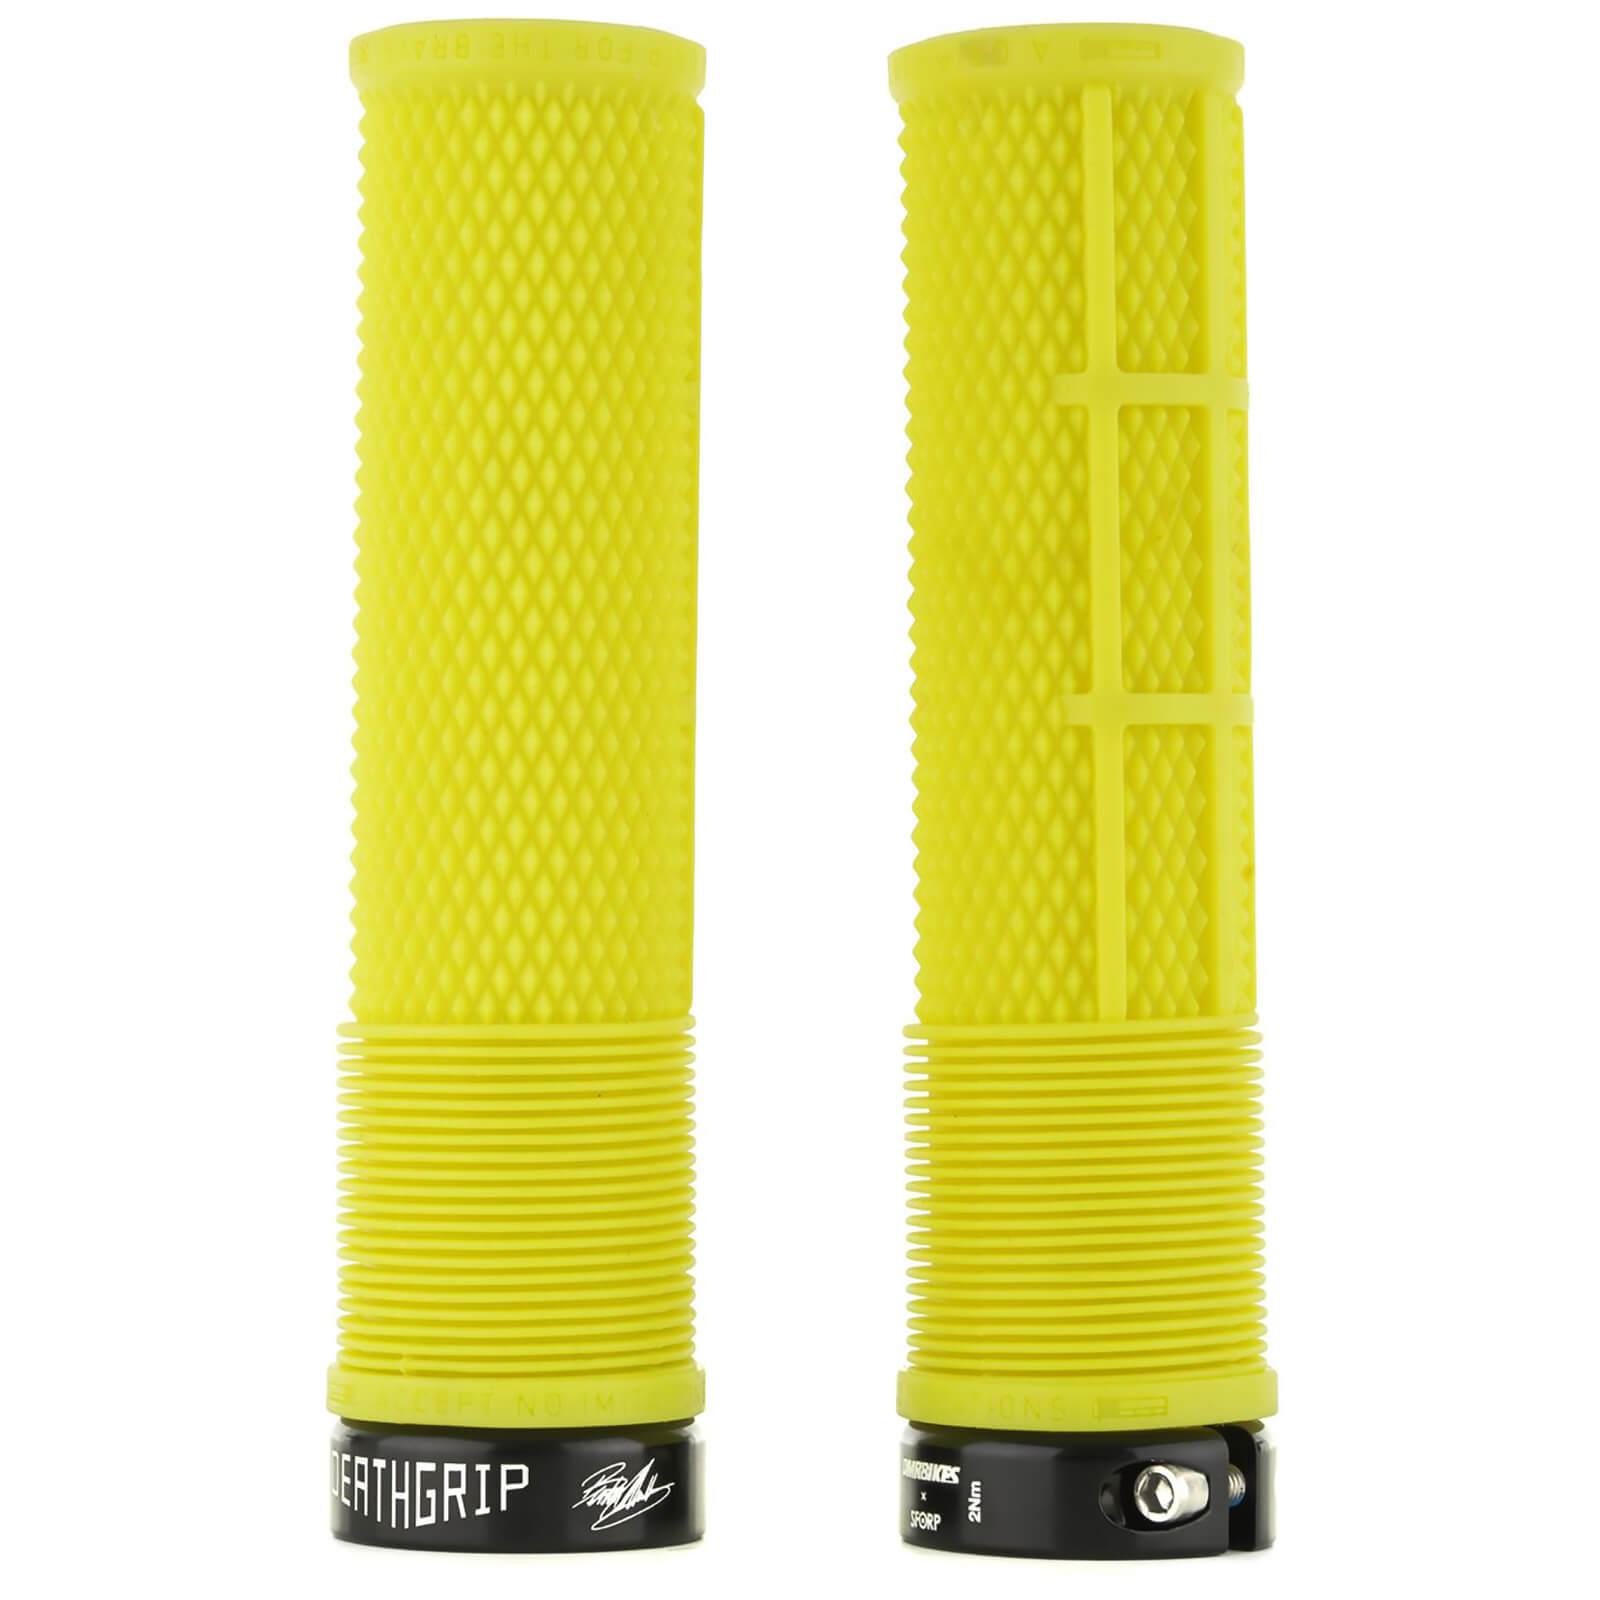 DMR Deathgrip Flangeless Handlebar Grip - Thick - 31.3mm - Gul Yellow